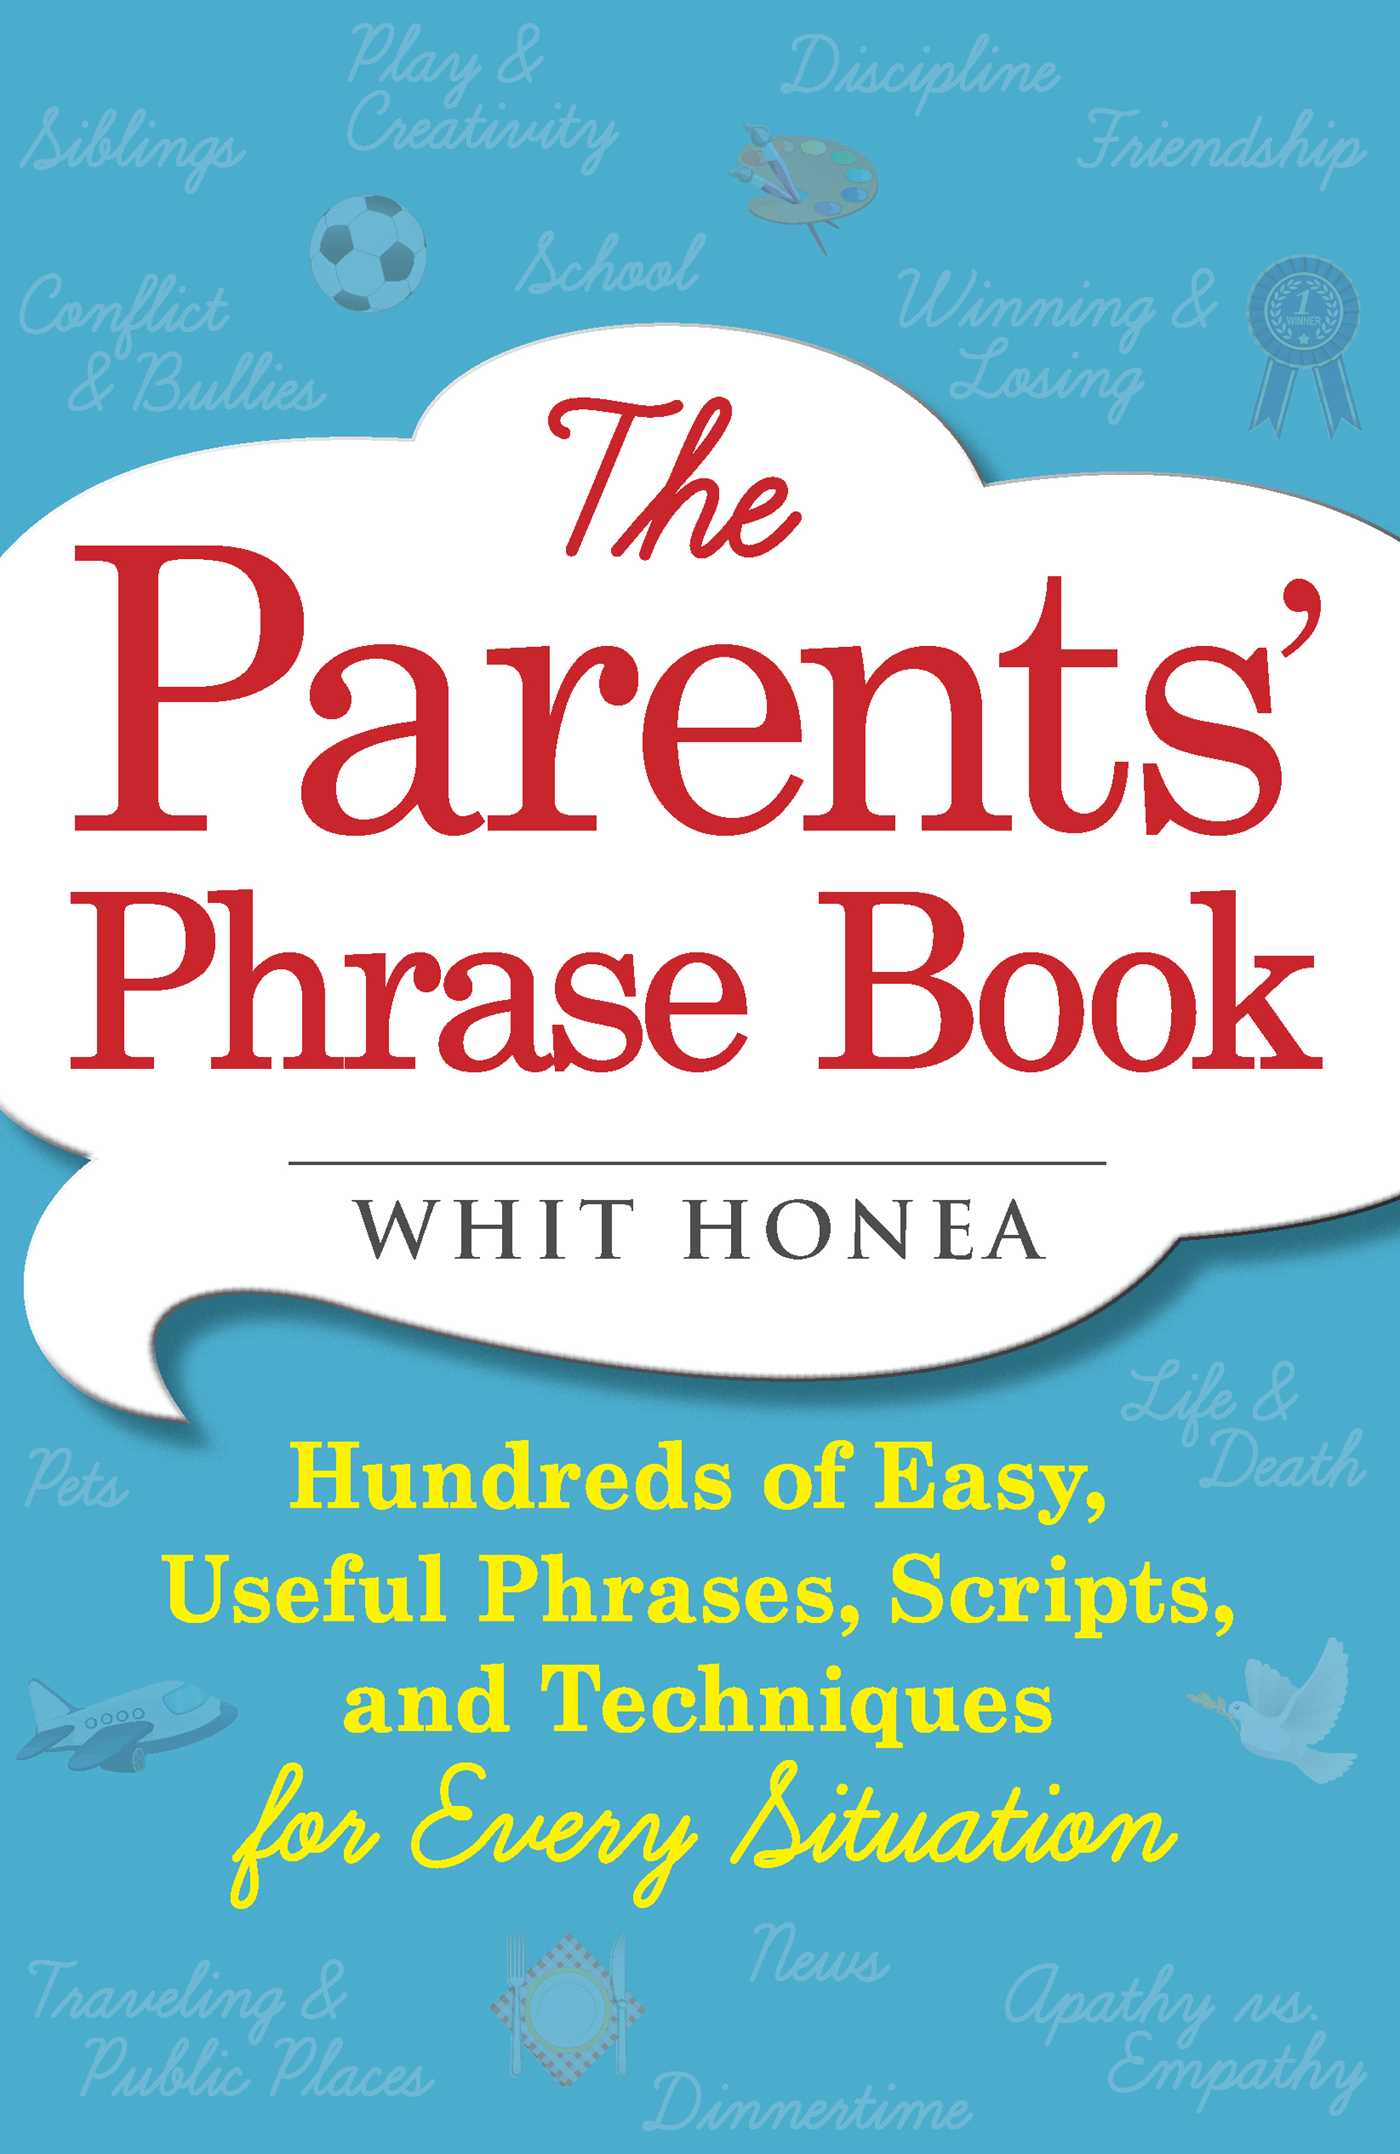 The parents phrase book 9781440570742 hr